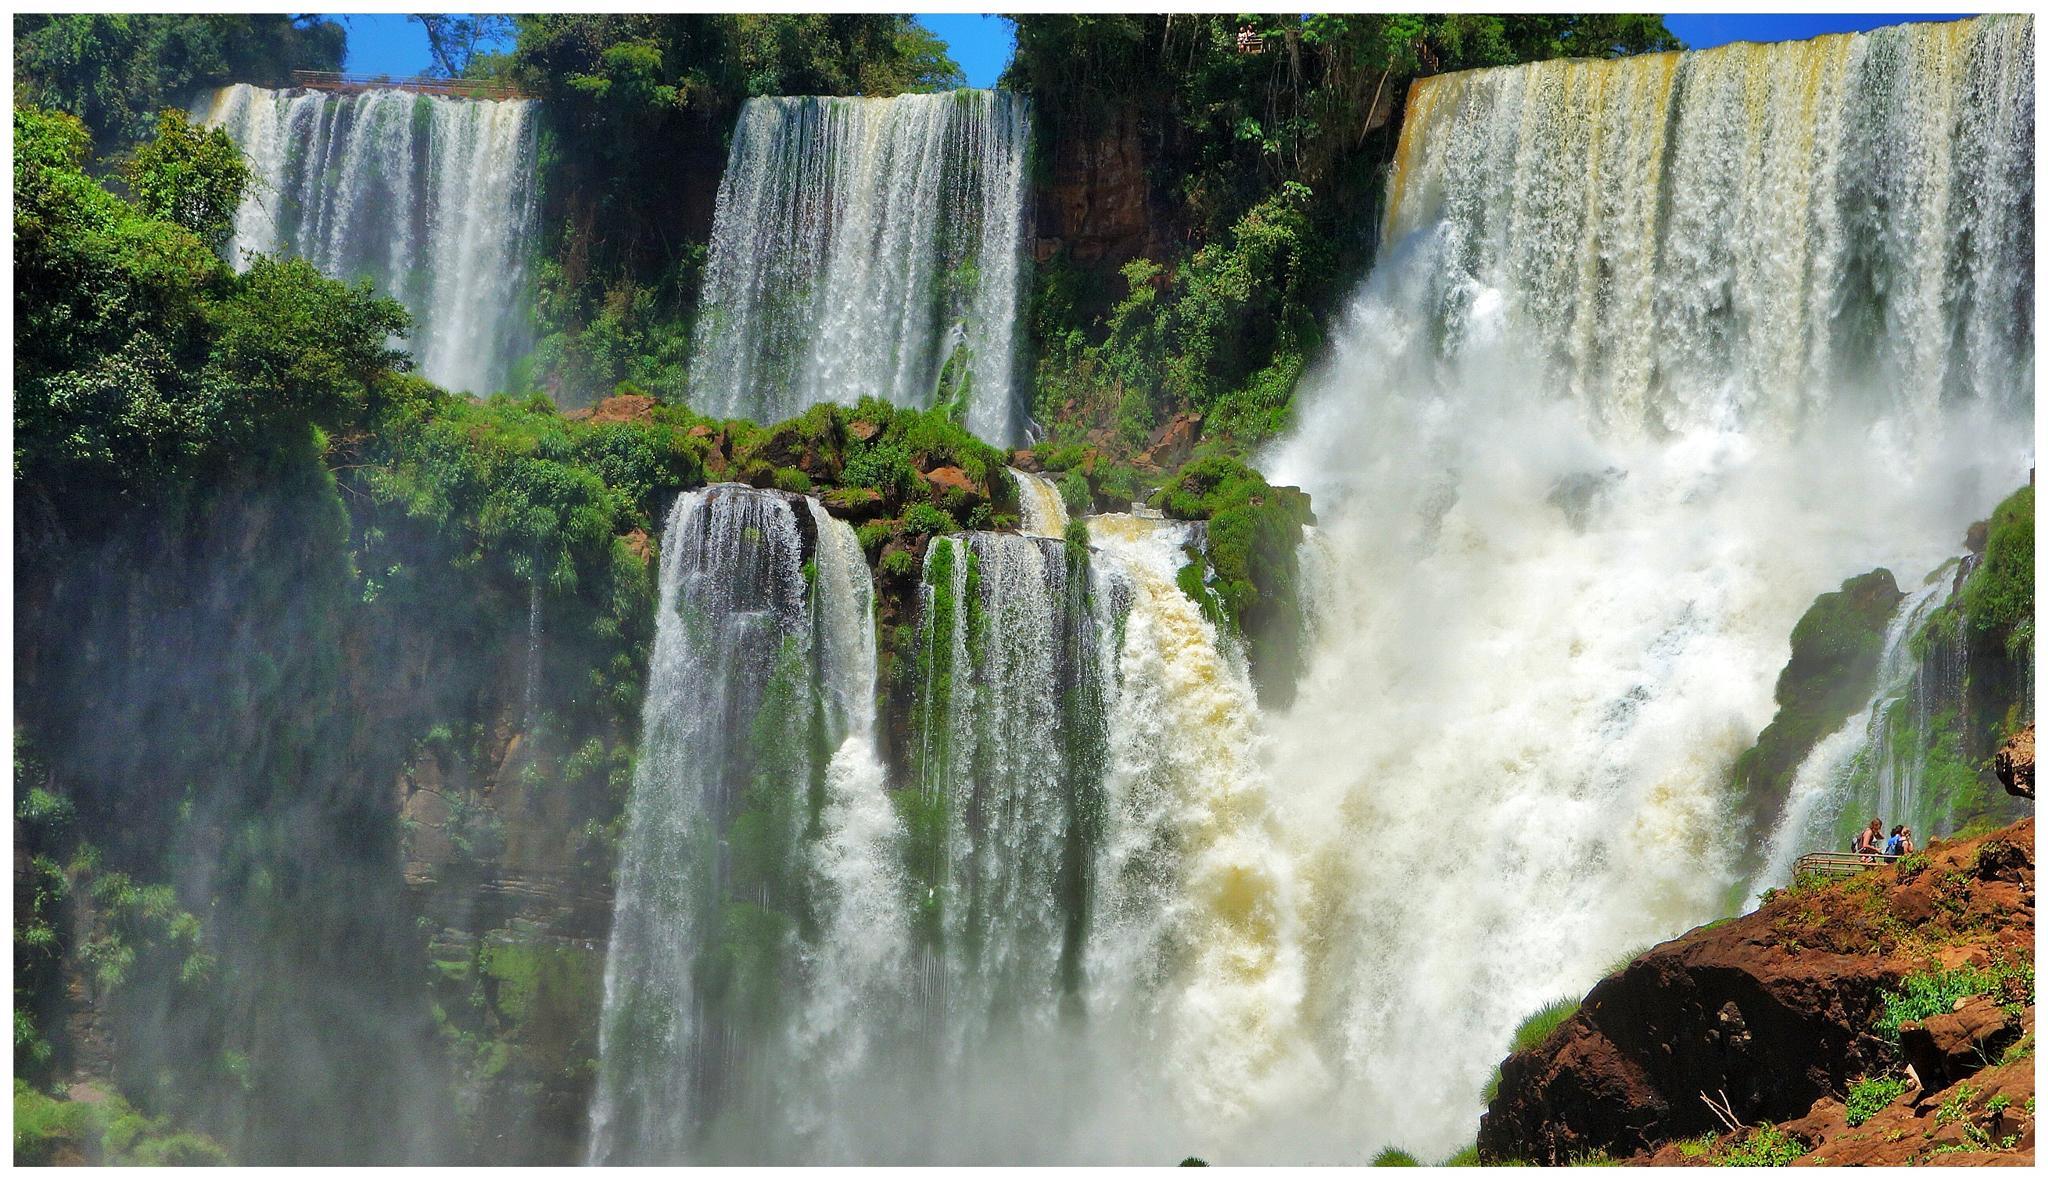 Iguazú en proximitat. Misiones. Argentina by bescosx